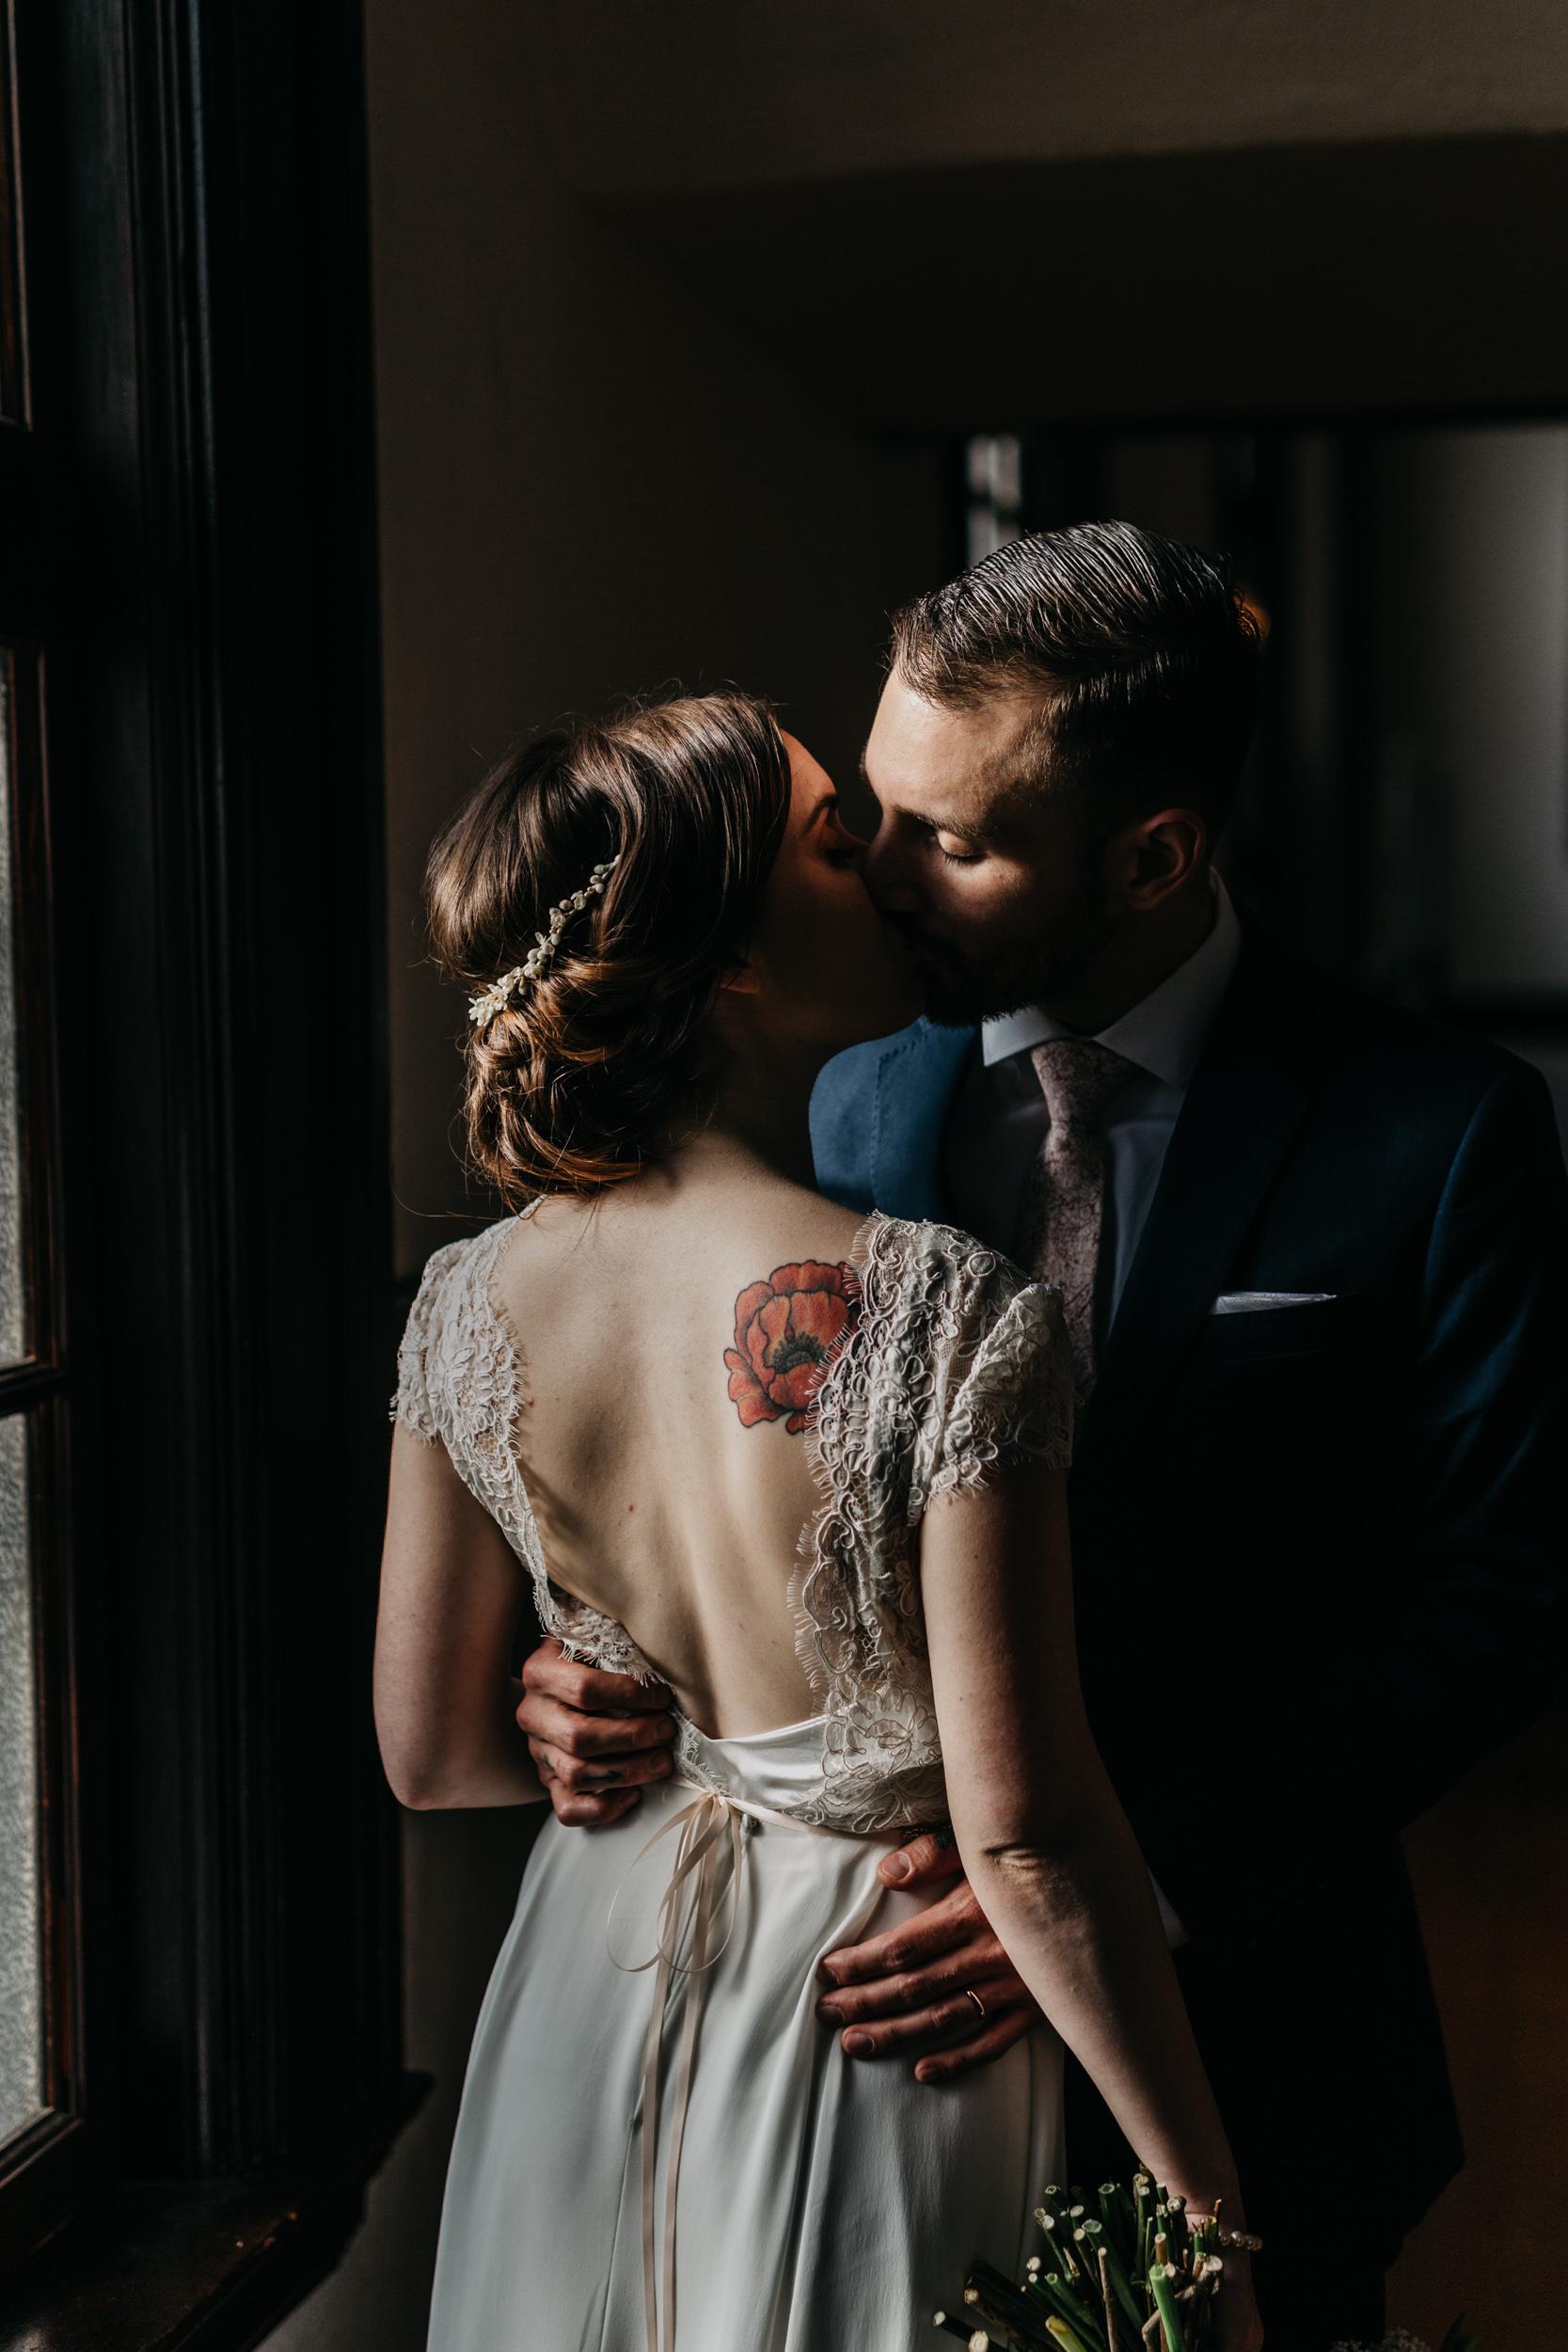 door-of-hope-wedding-portland-artistic-wedding-photography-2229.jpg